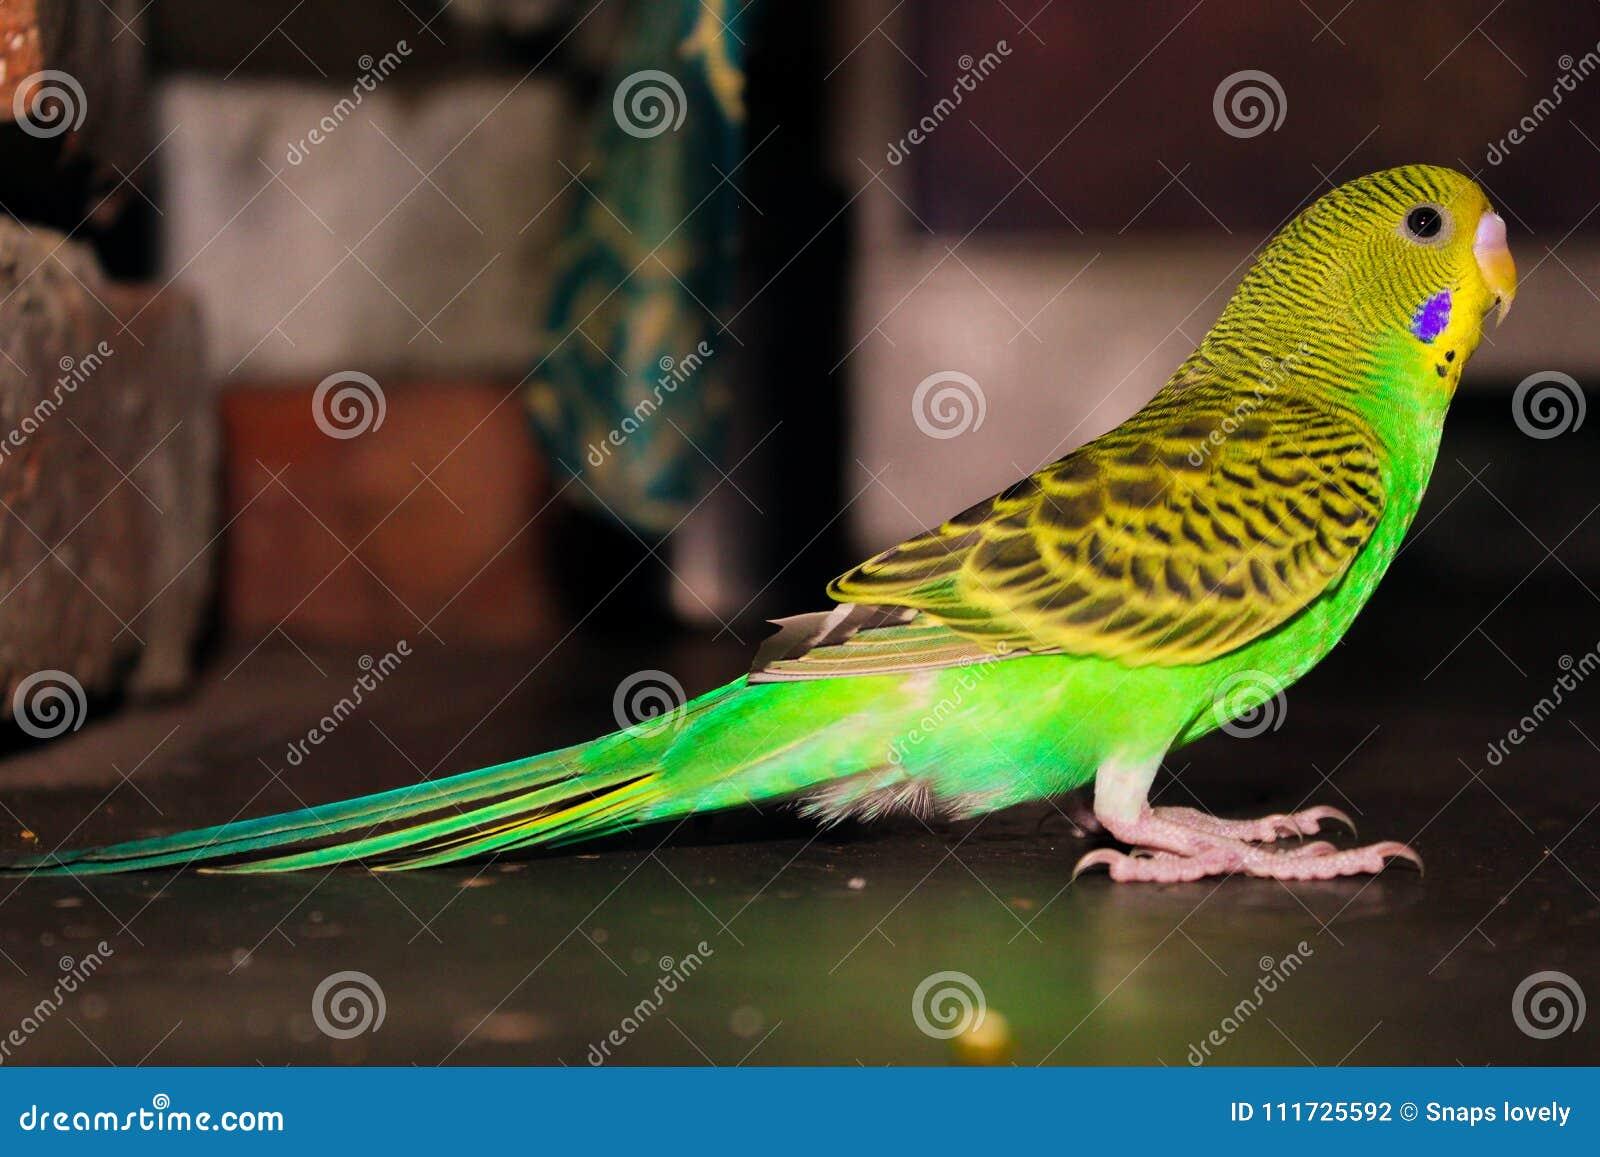 Lovebird Beautiful Green And Yellow Lovebird Stock Photo Image Of Green Lovely 111725592